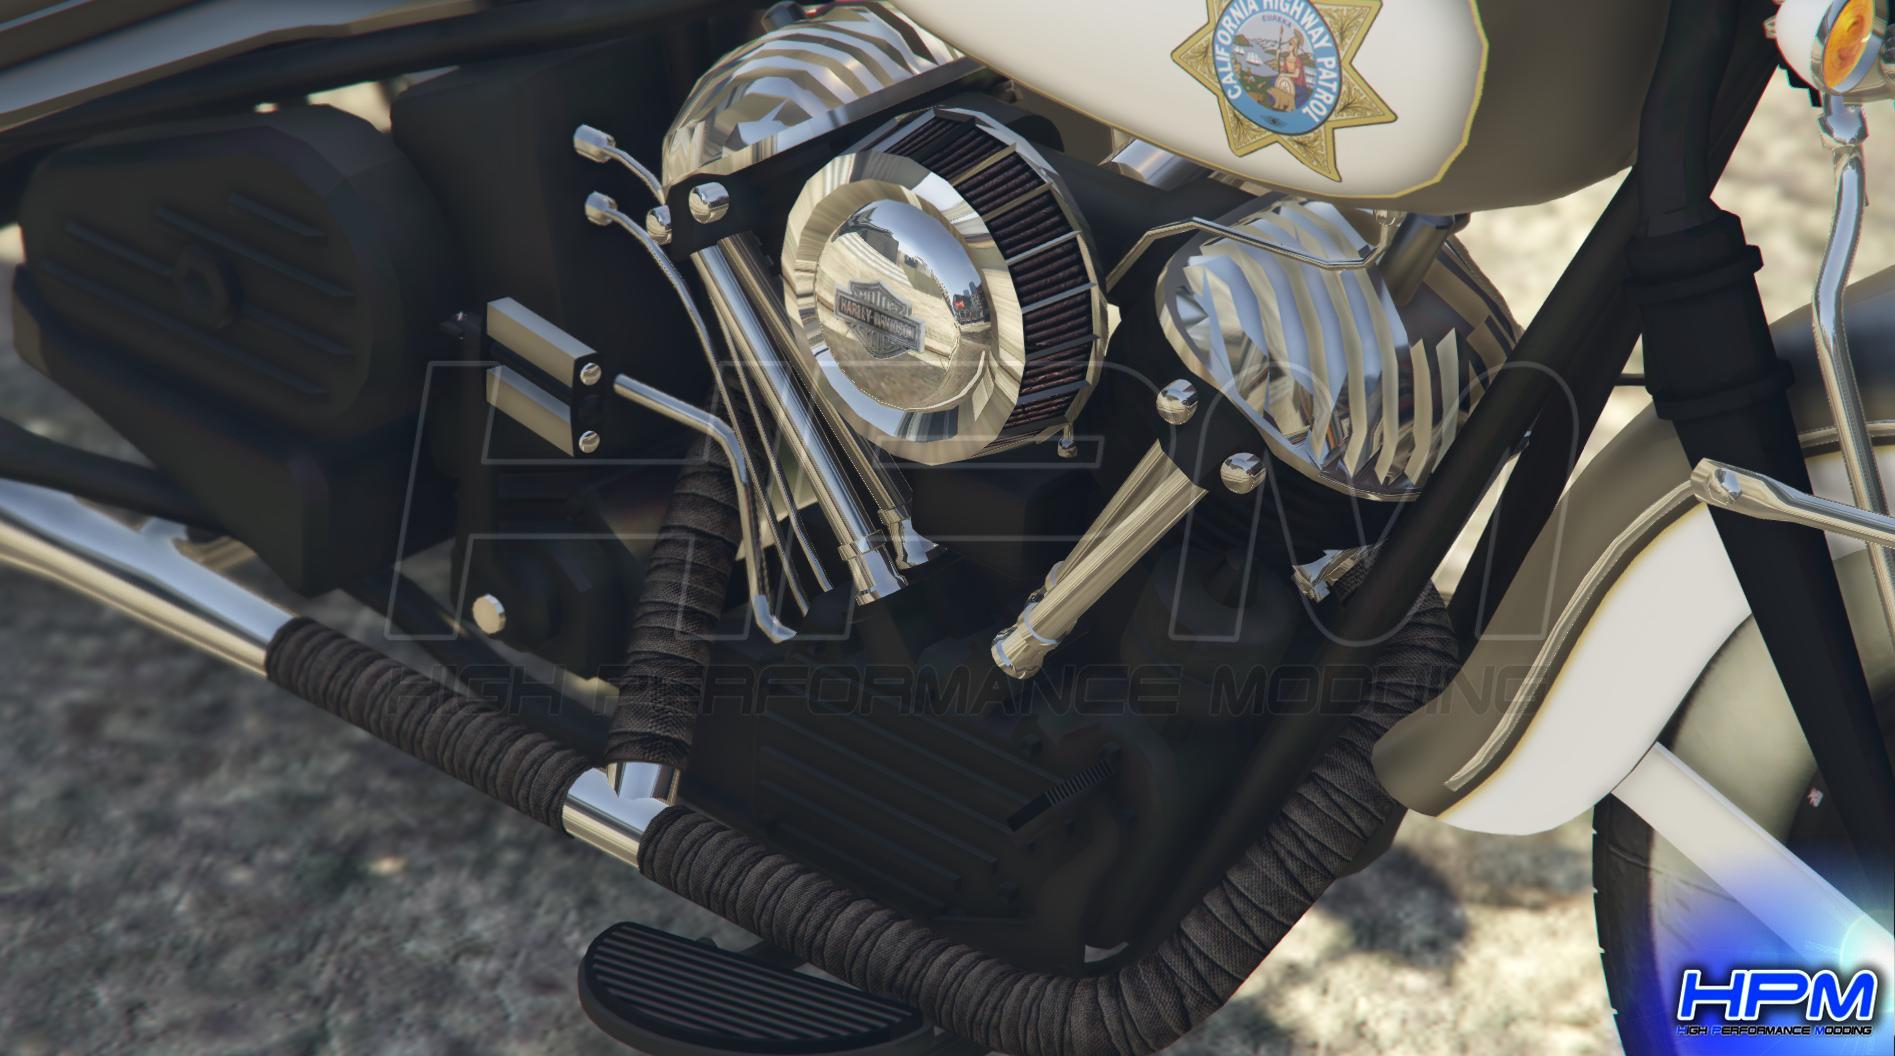 Harley Davidson Knucklehead 1947 Service Car - Police Version - GTA5